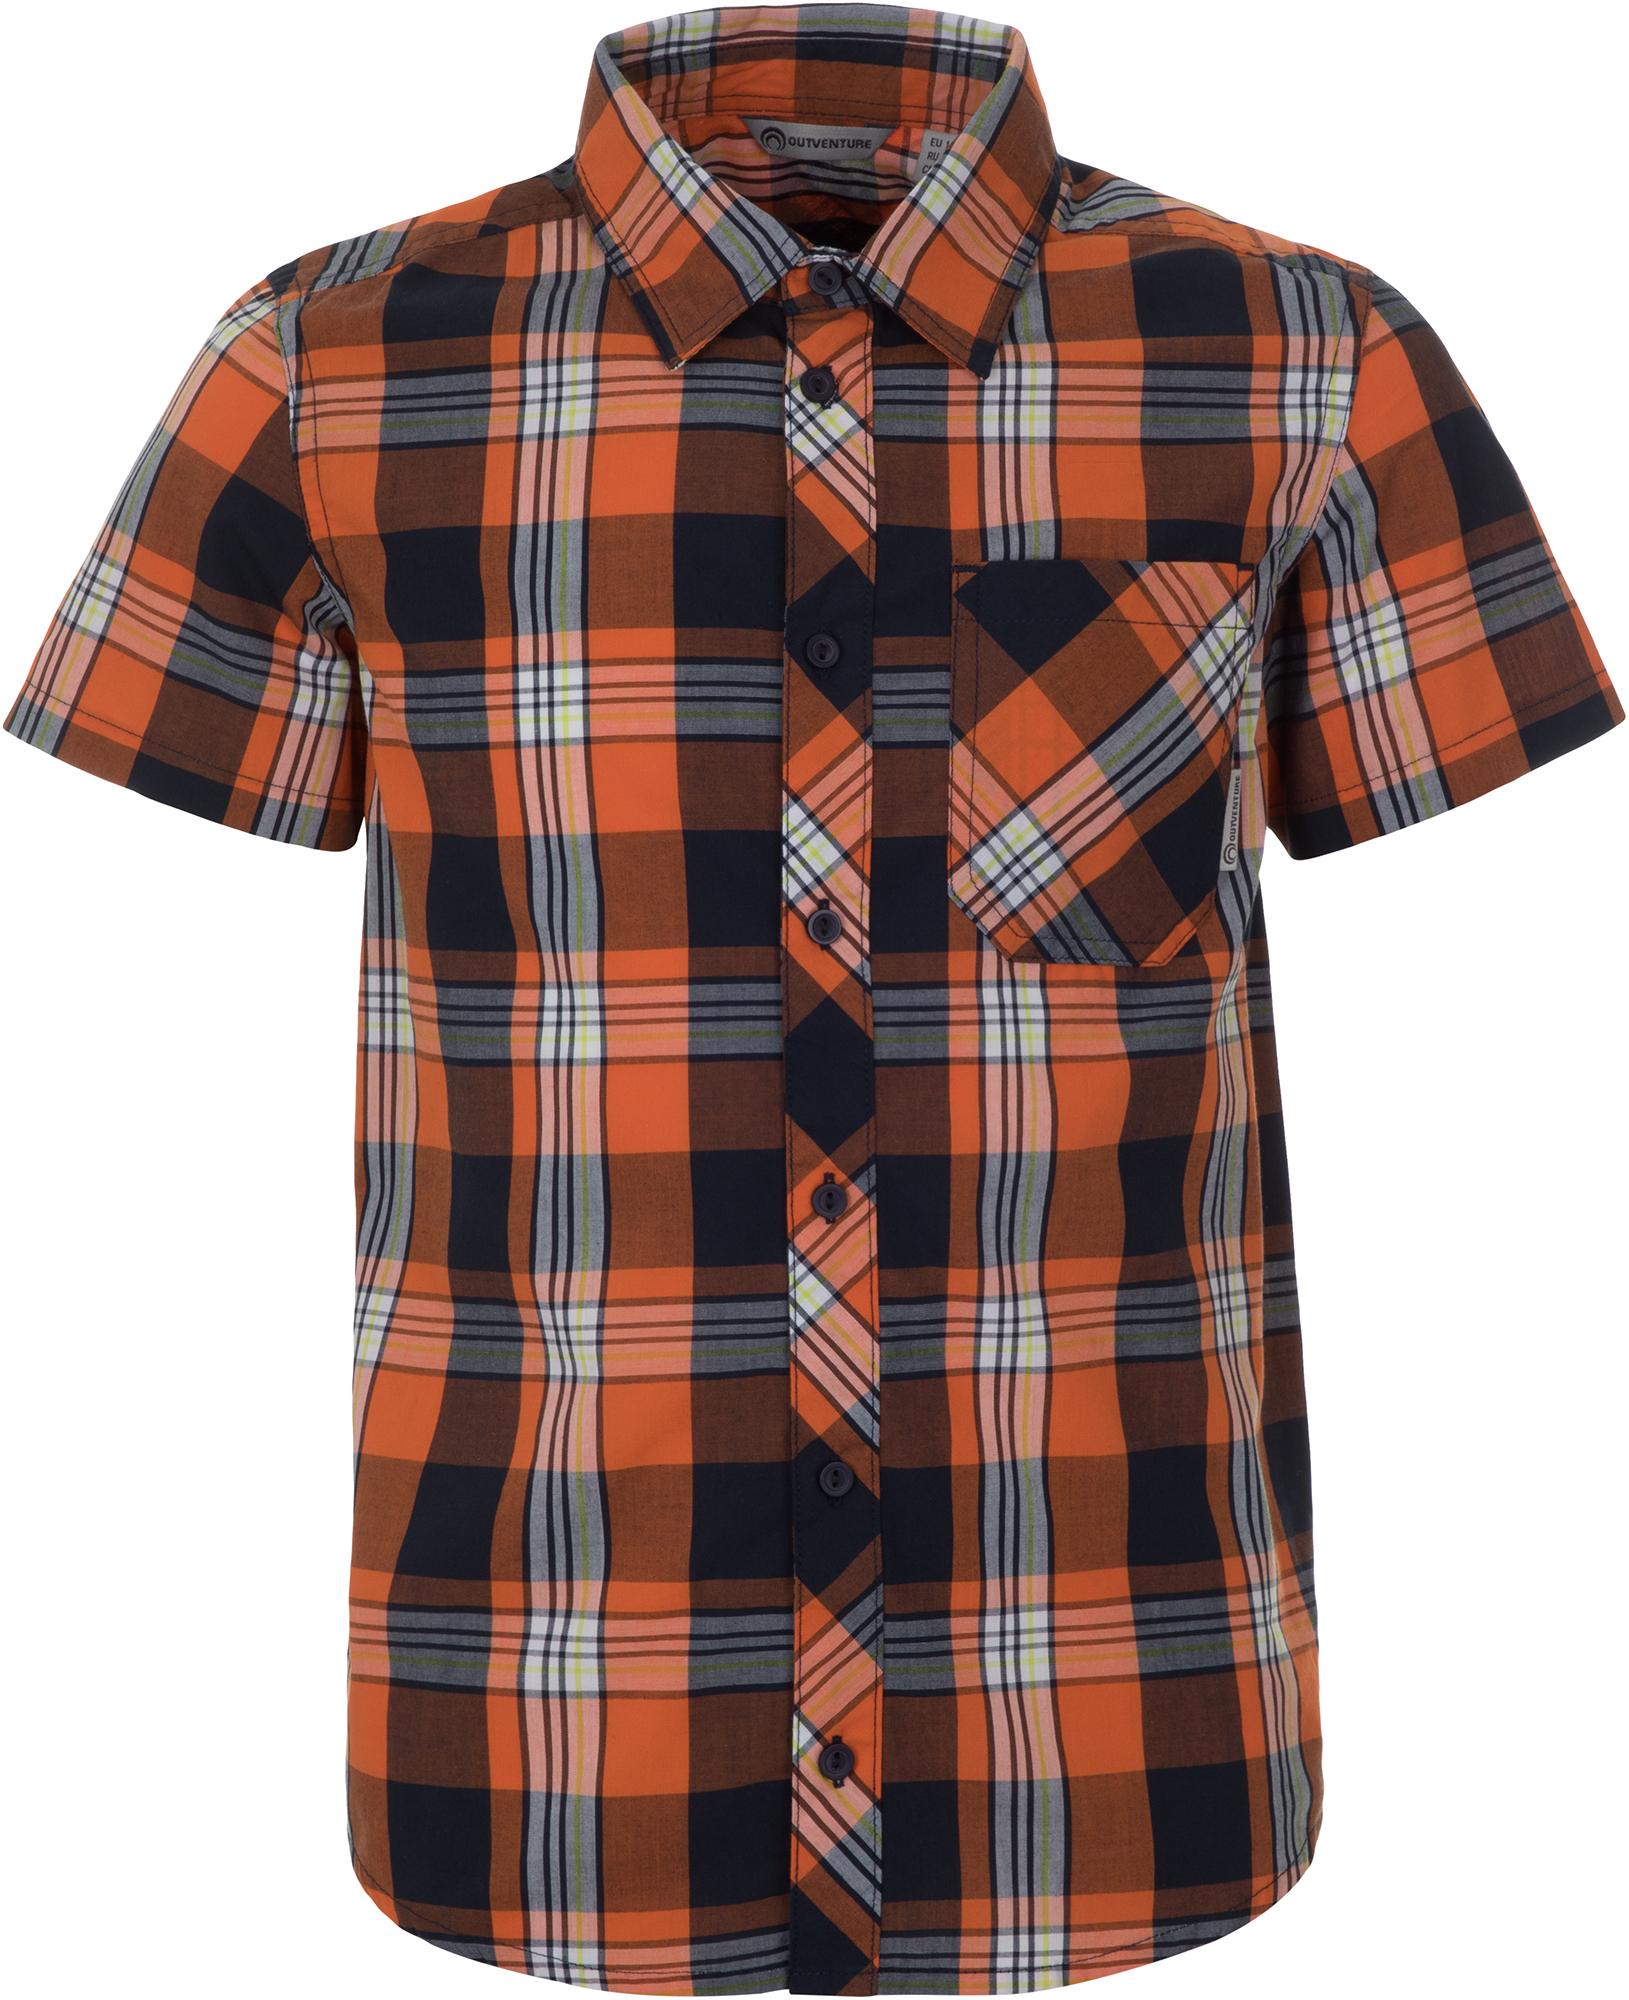 Outventure Рубашка с коротким рукавом для мальчиков Outventure, размер 170